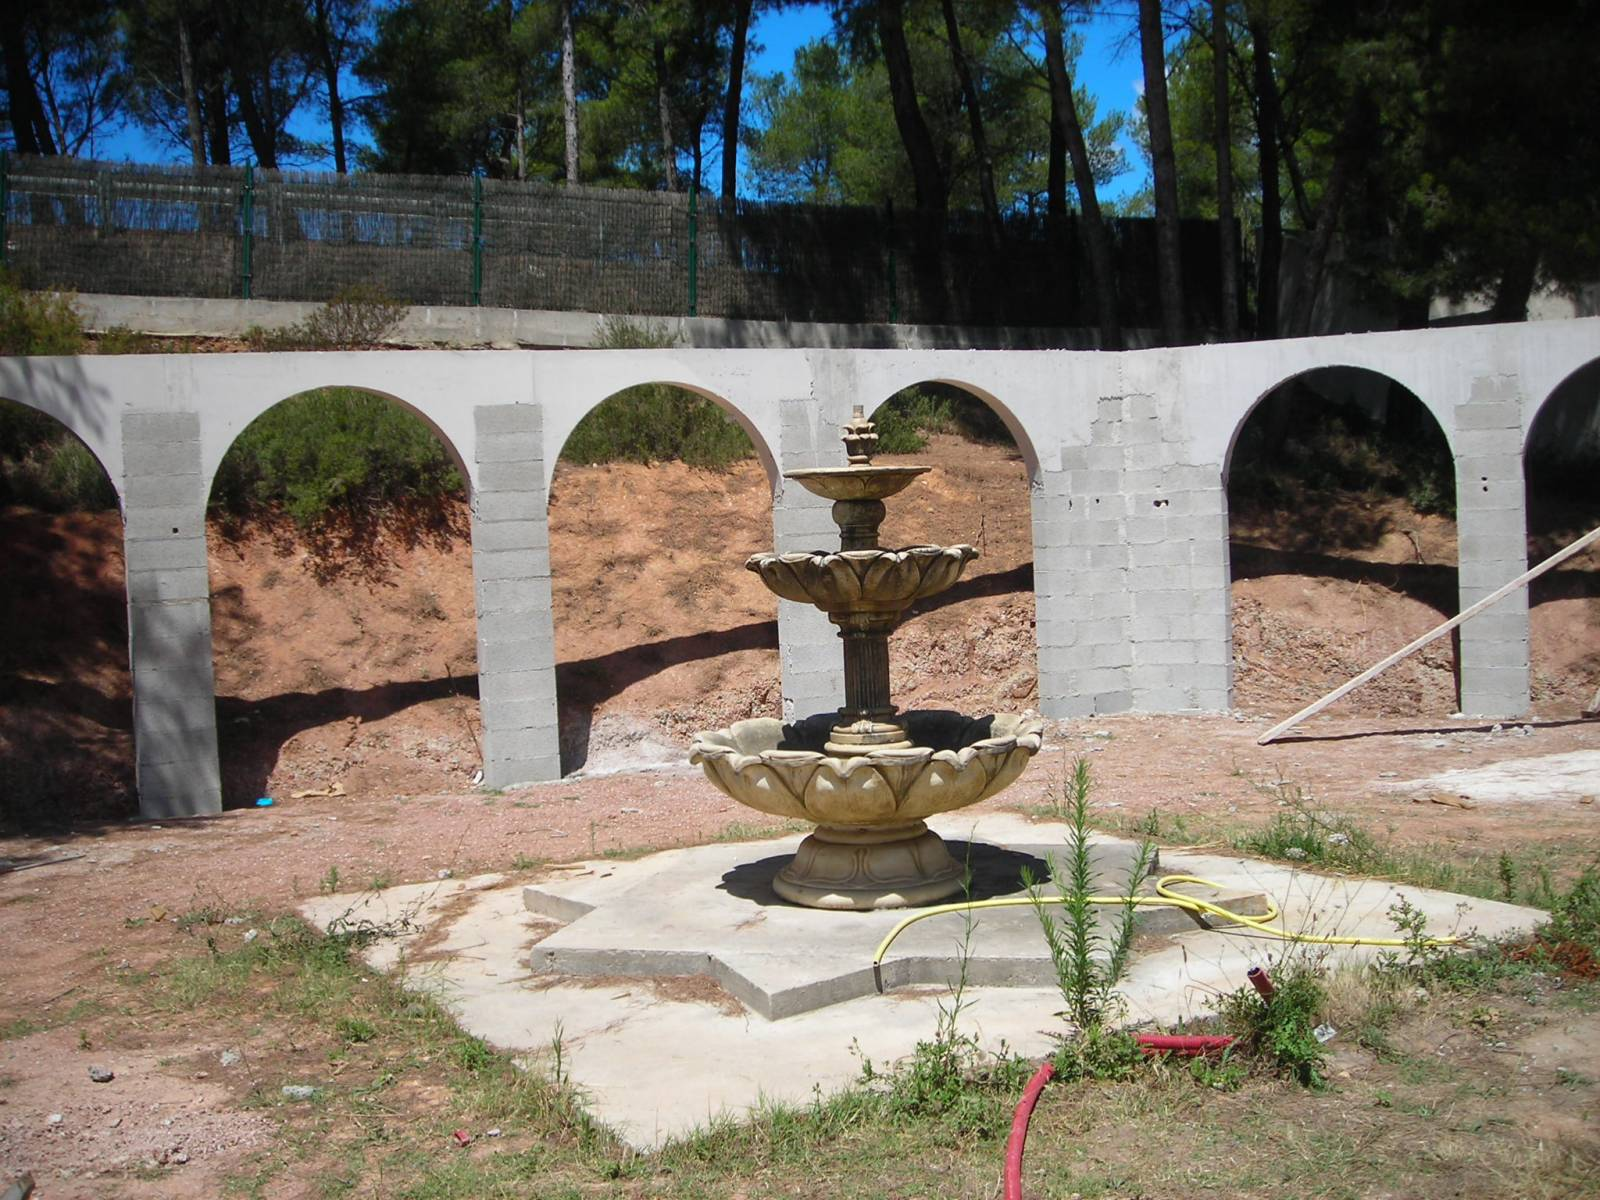 Linteau En Arc De Cercle fabrication de coffrages de pleins cintres en polystyrène